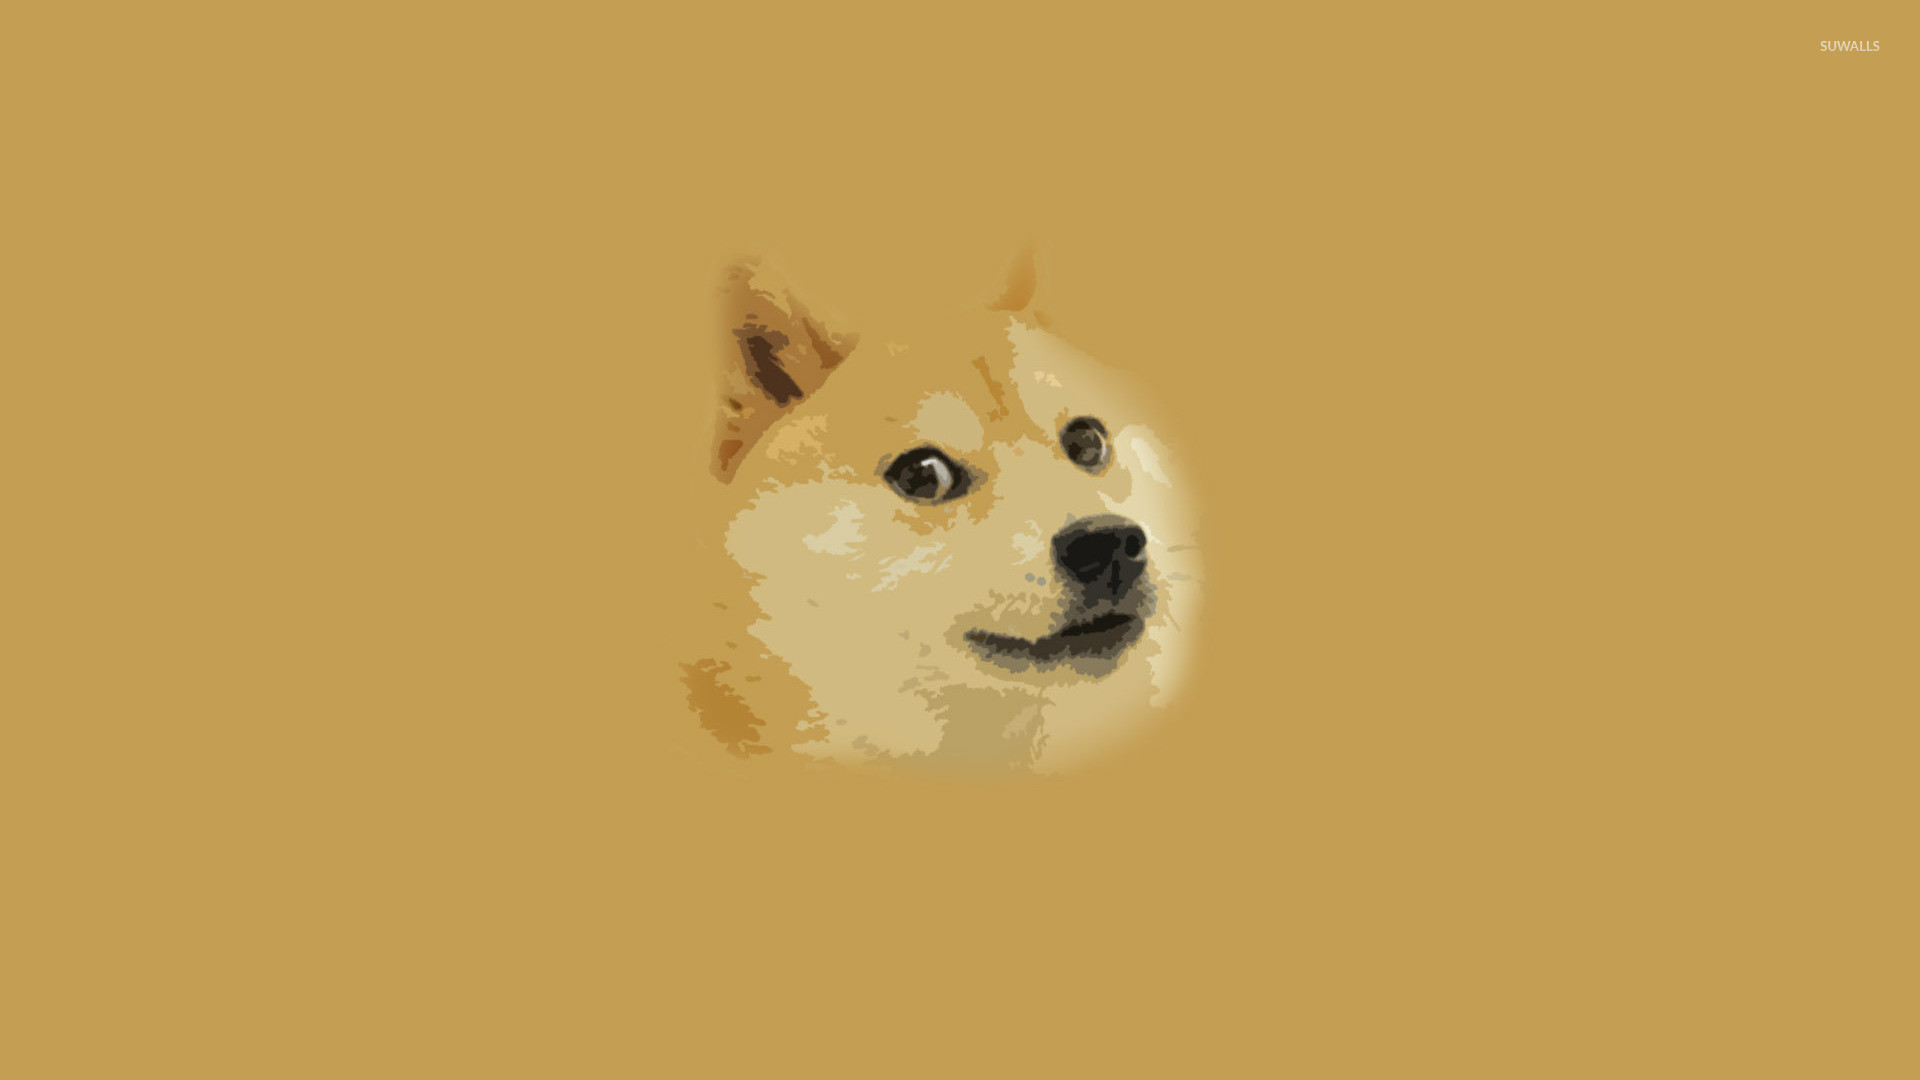 Doge wallpaper 1920×1080